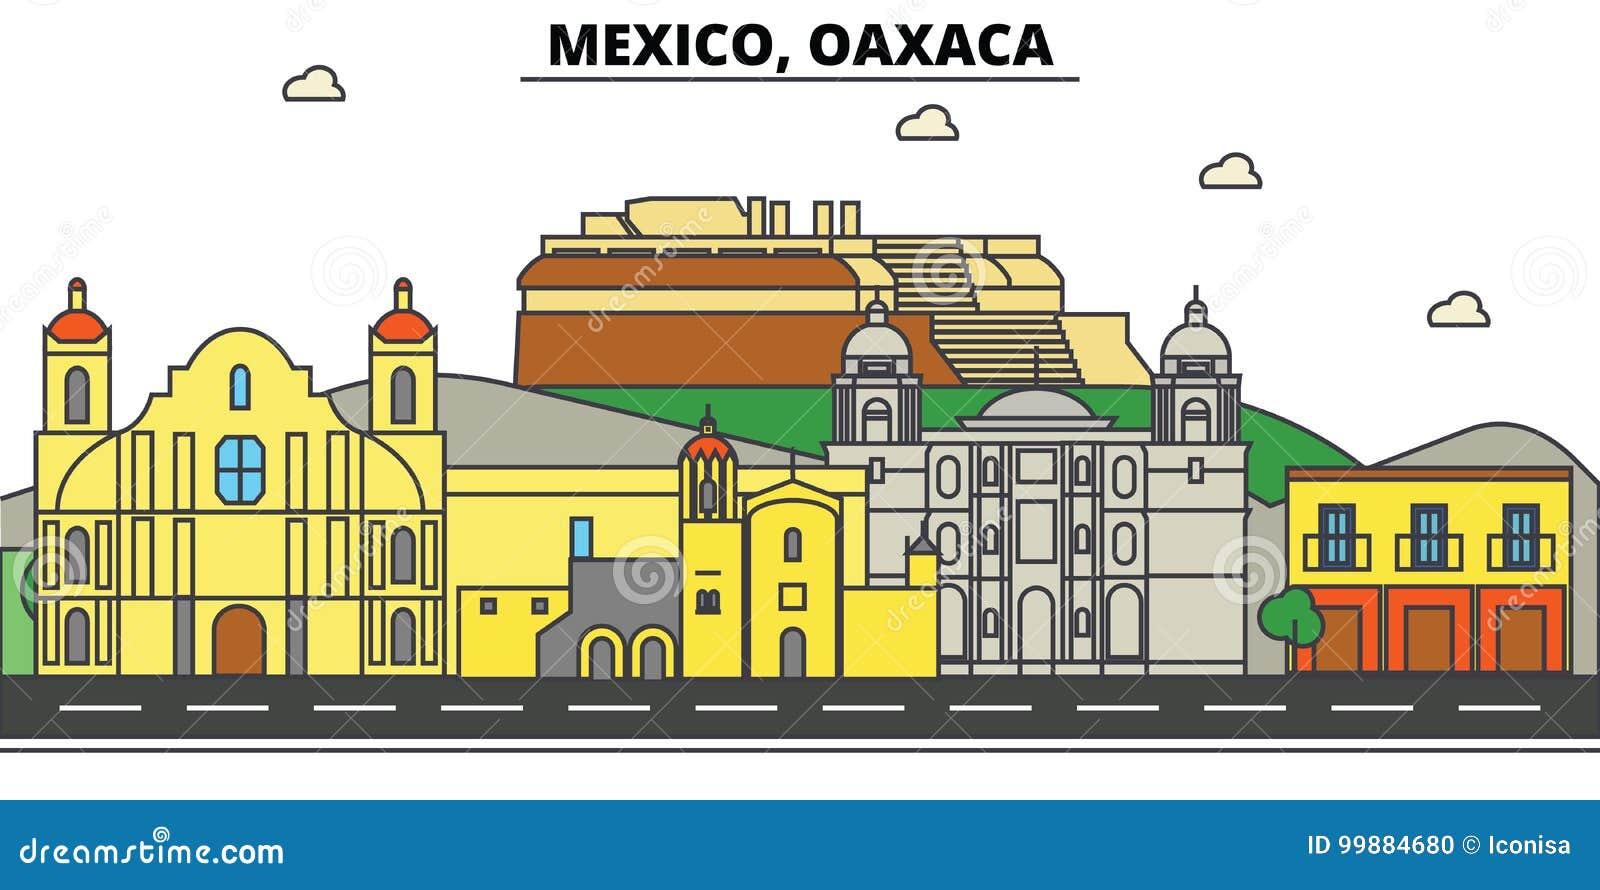 Mexico, Oaxaca Stadshorizon, architectuur, gebouwen, straten, silhouet, landschap, panorama, oriëntatiepunten, pictogrammen